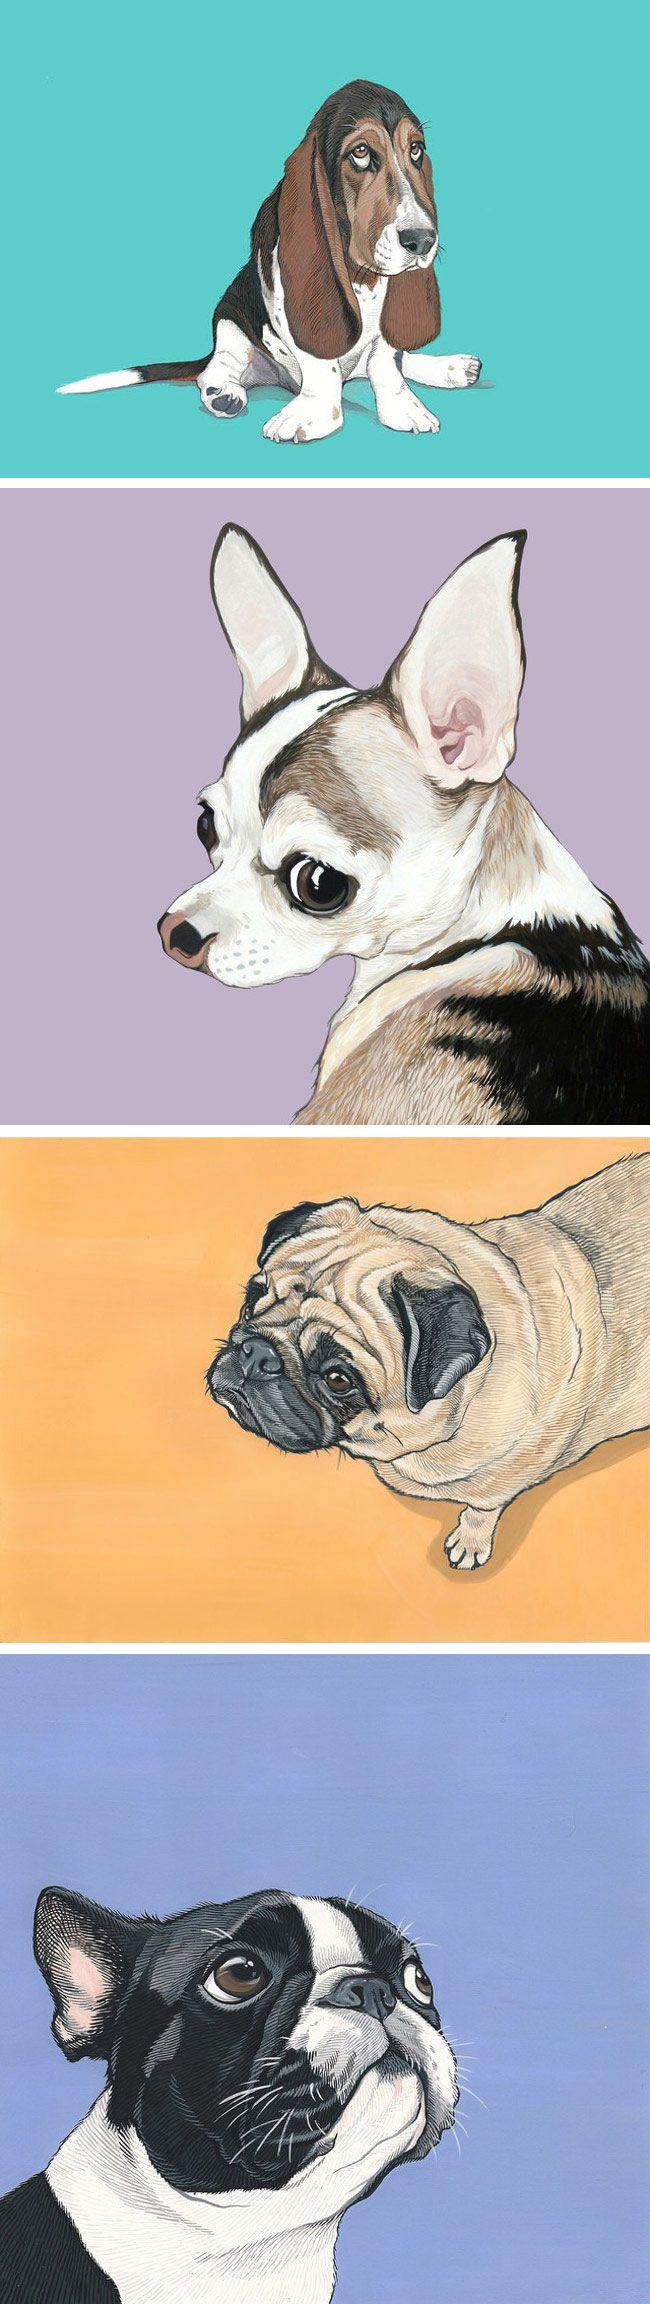 Custom pop-art style pet portraits by Manda Wolfe | The Pet Anthology